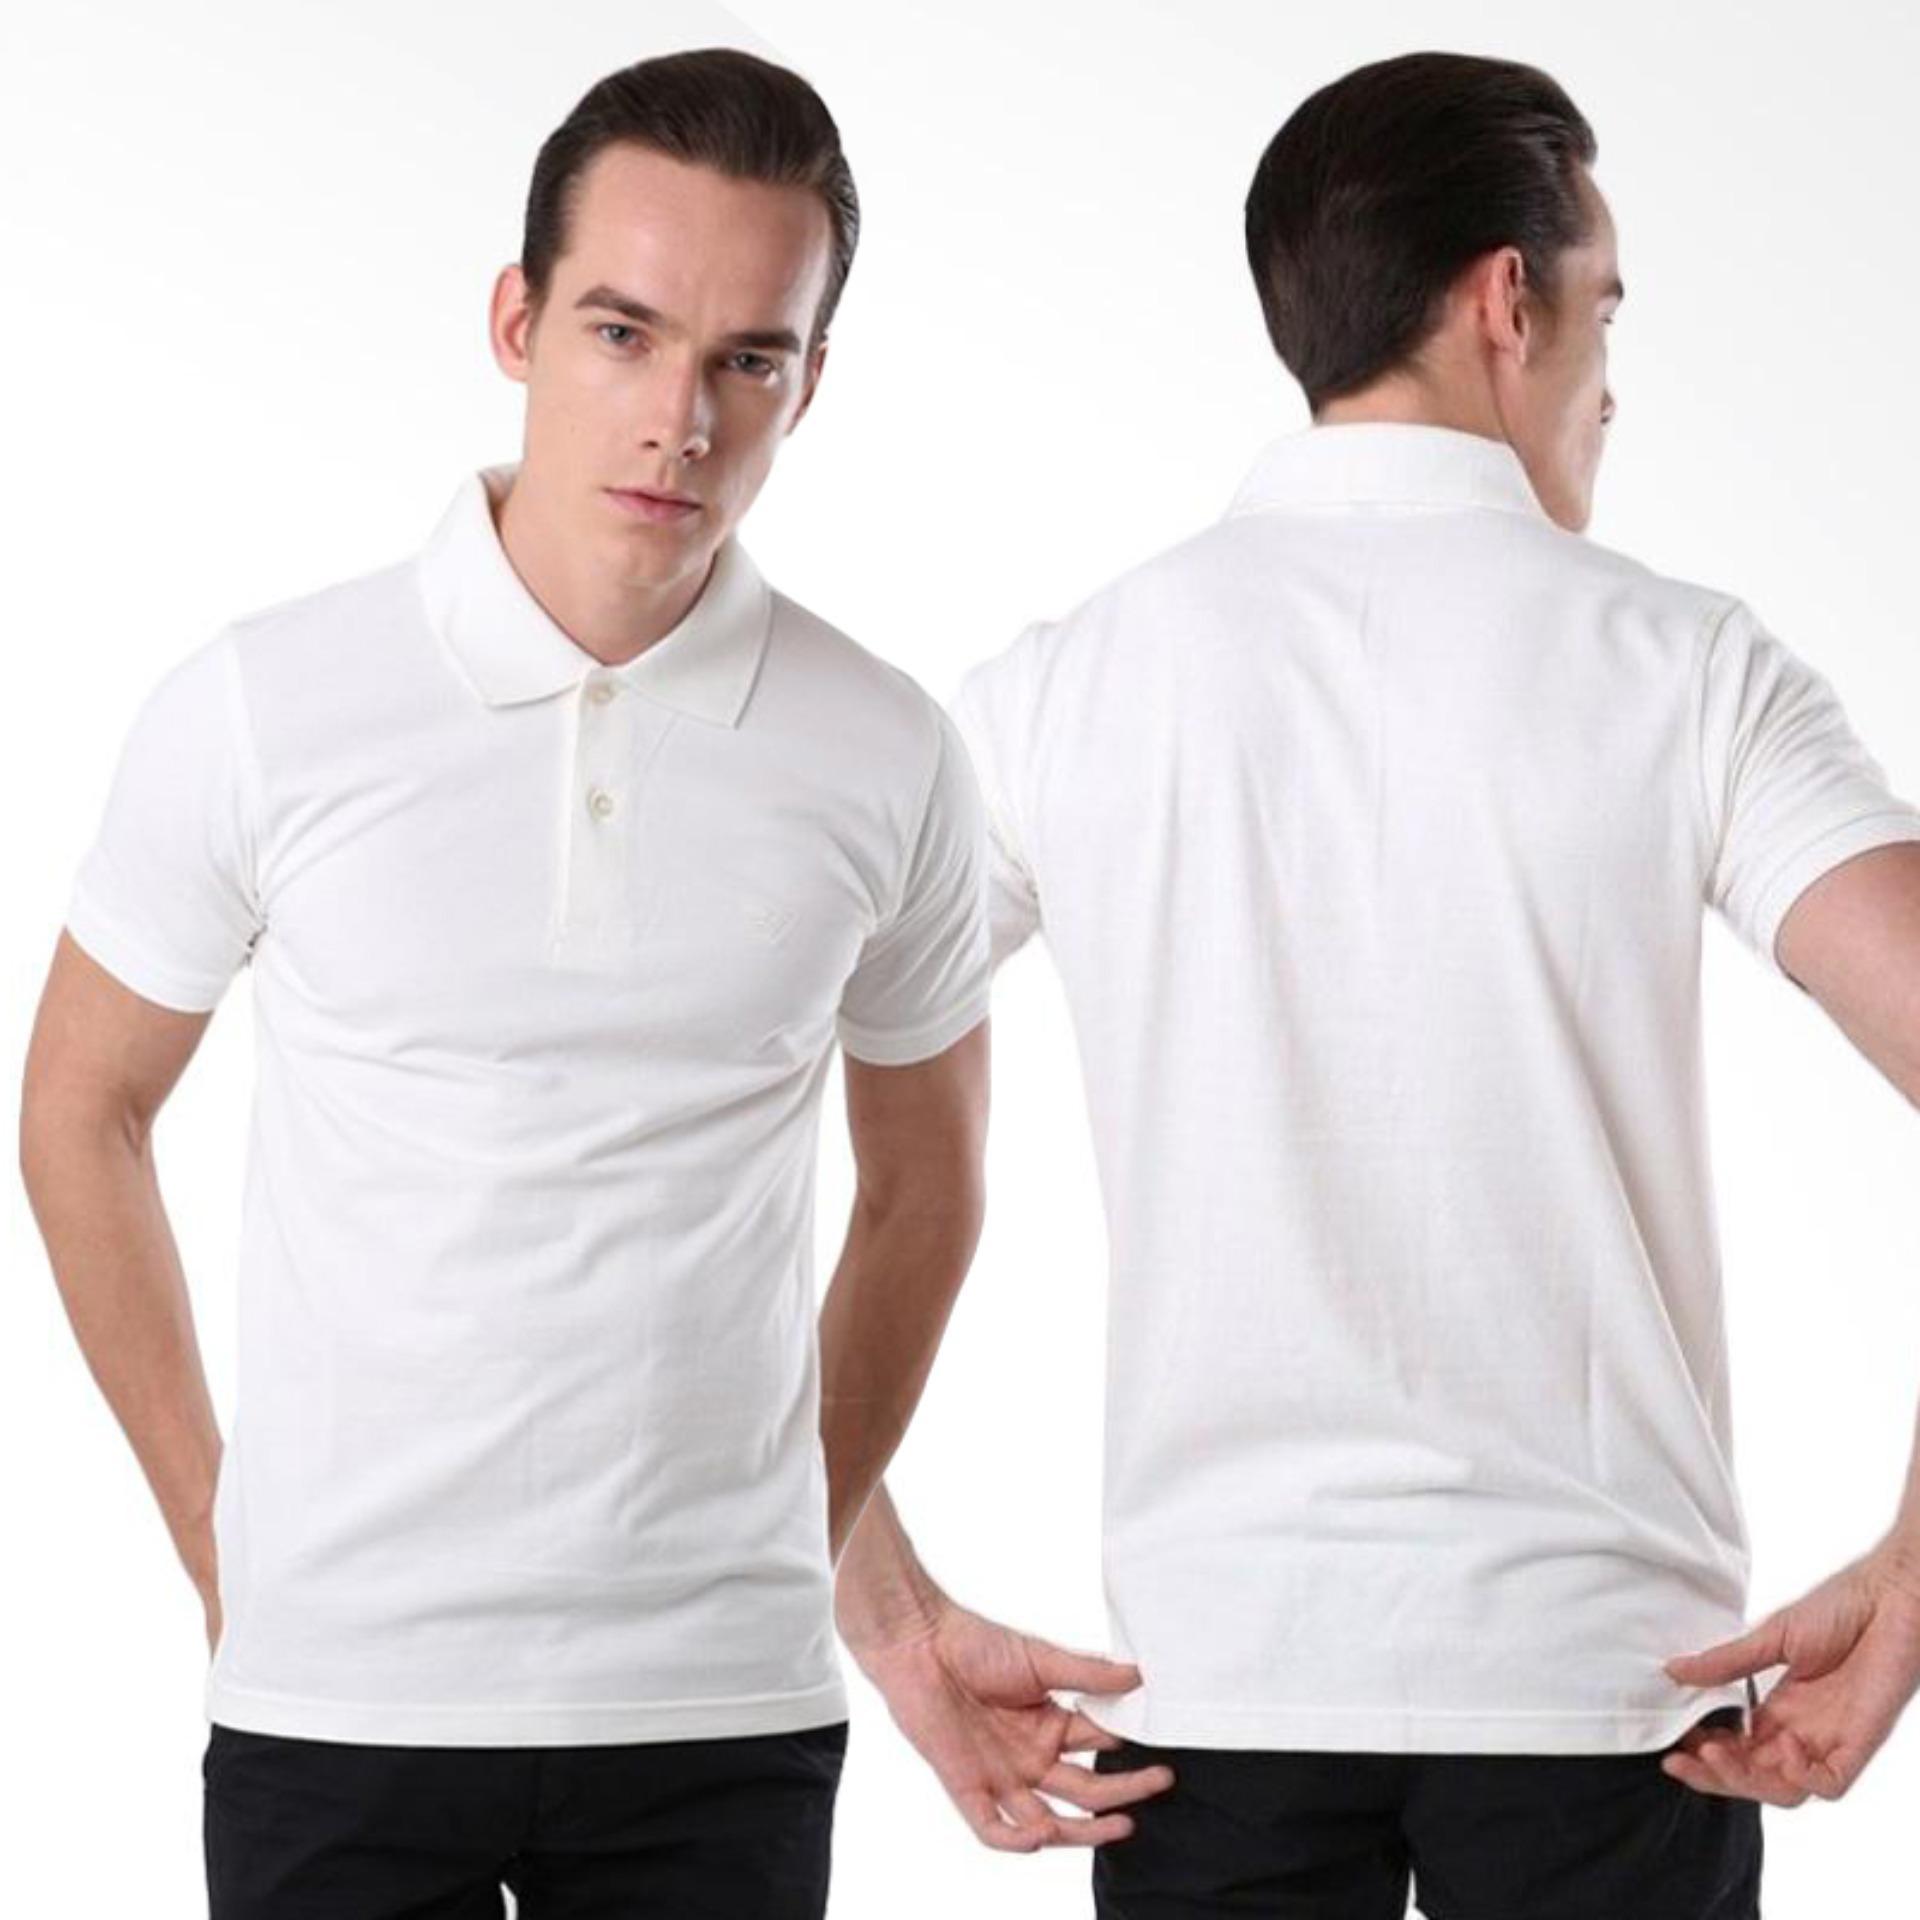 ATT - Baju Kaos Kerah Polos - SJ66 - Polo - Lacos